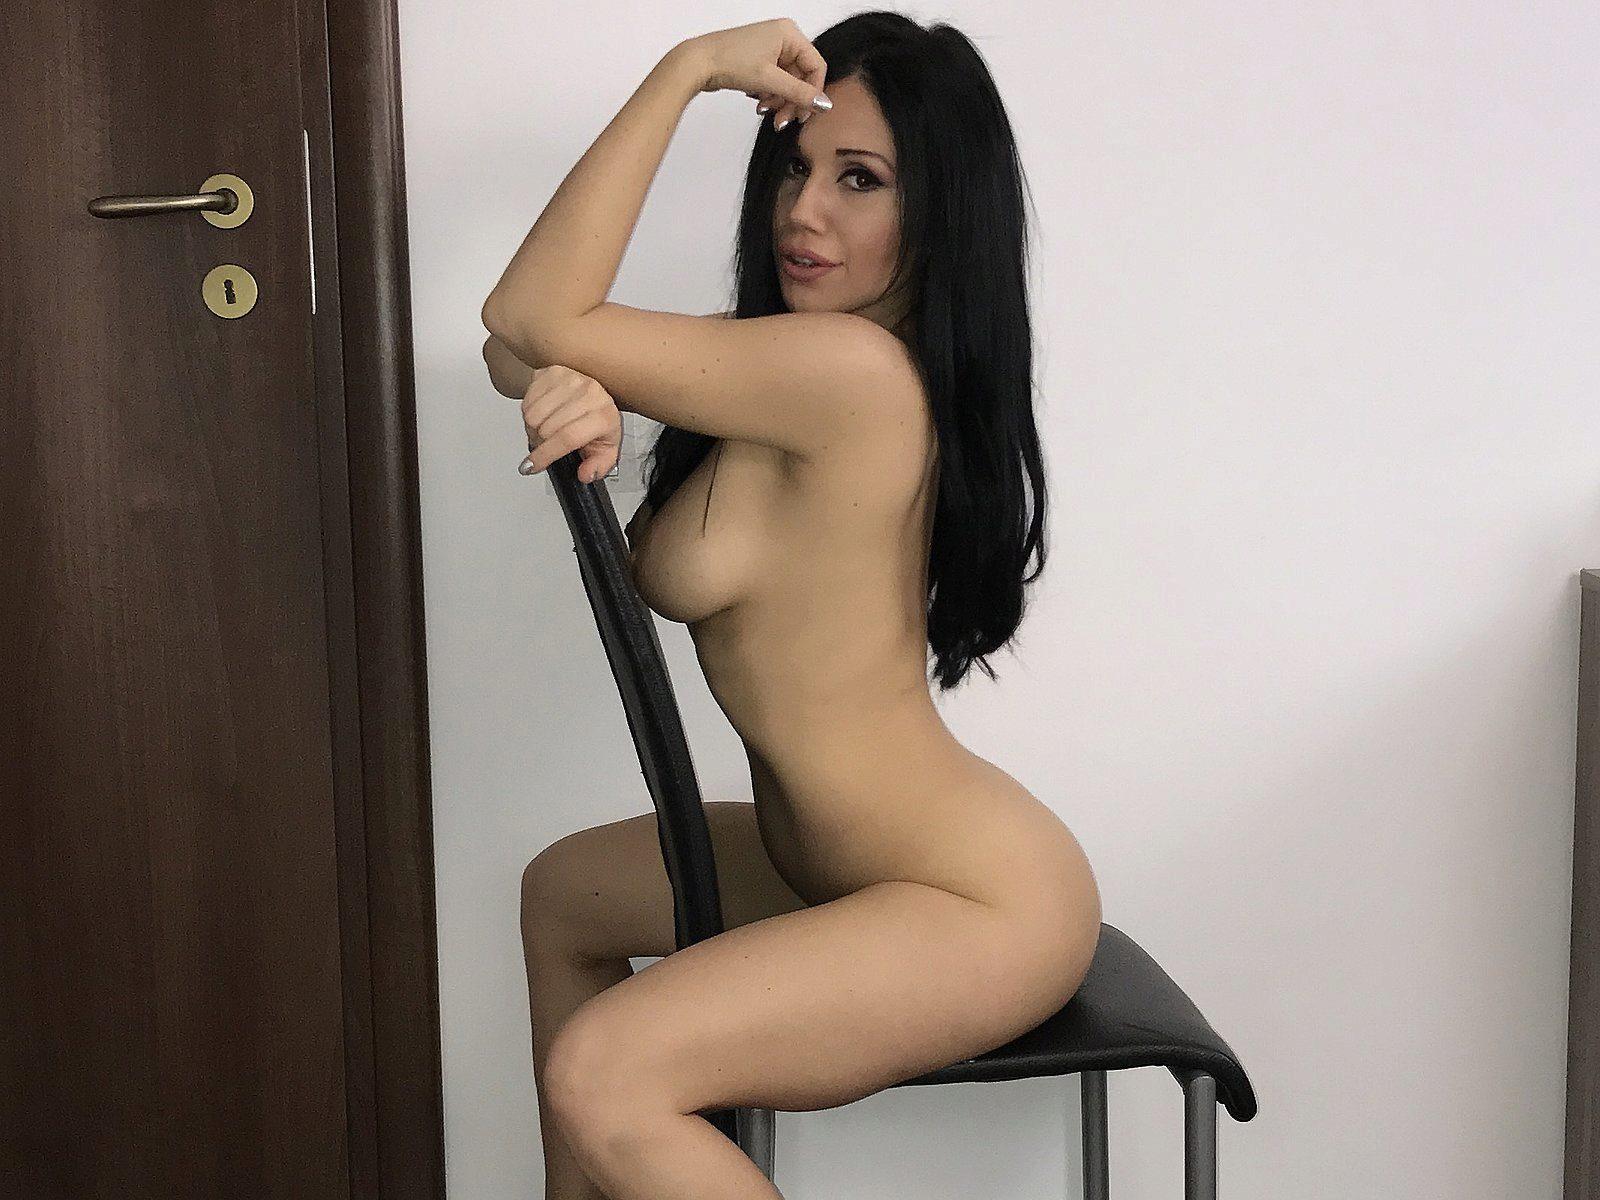 MarrylouAnne